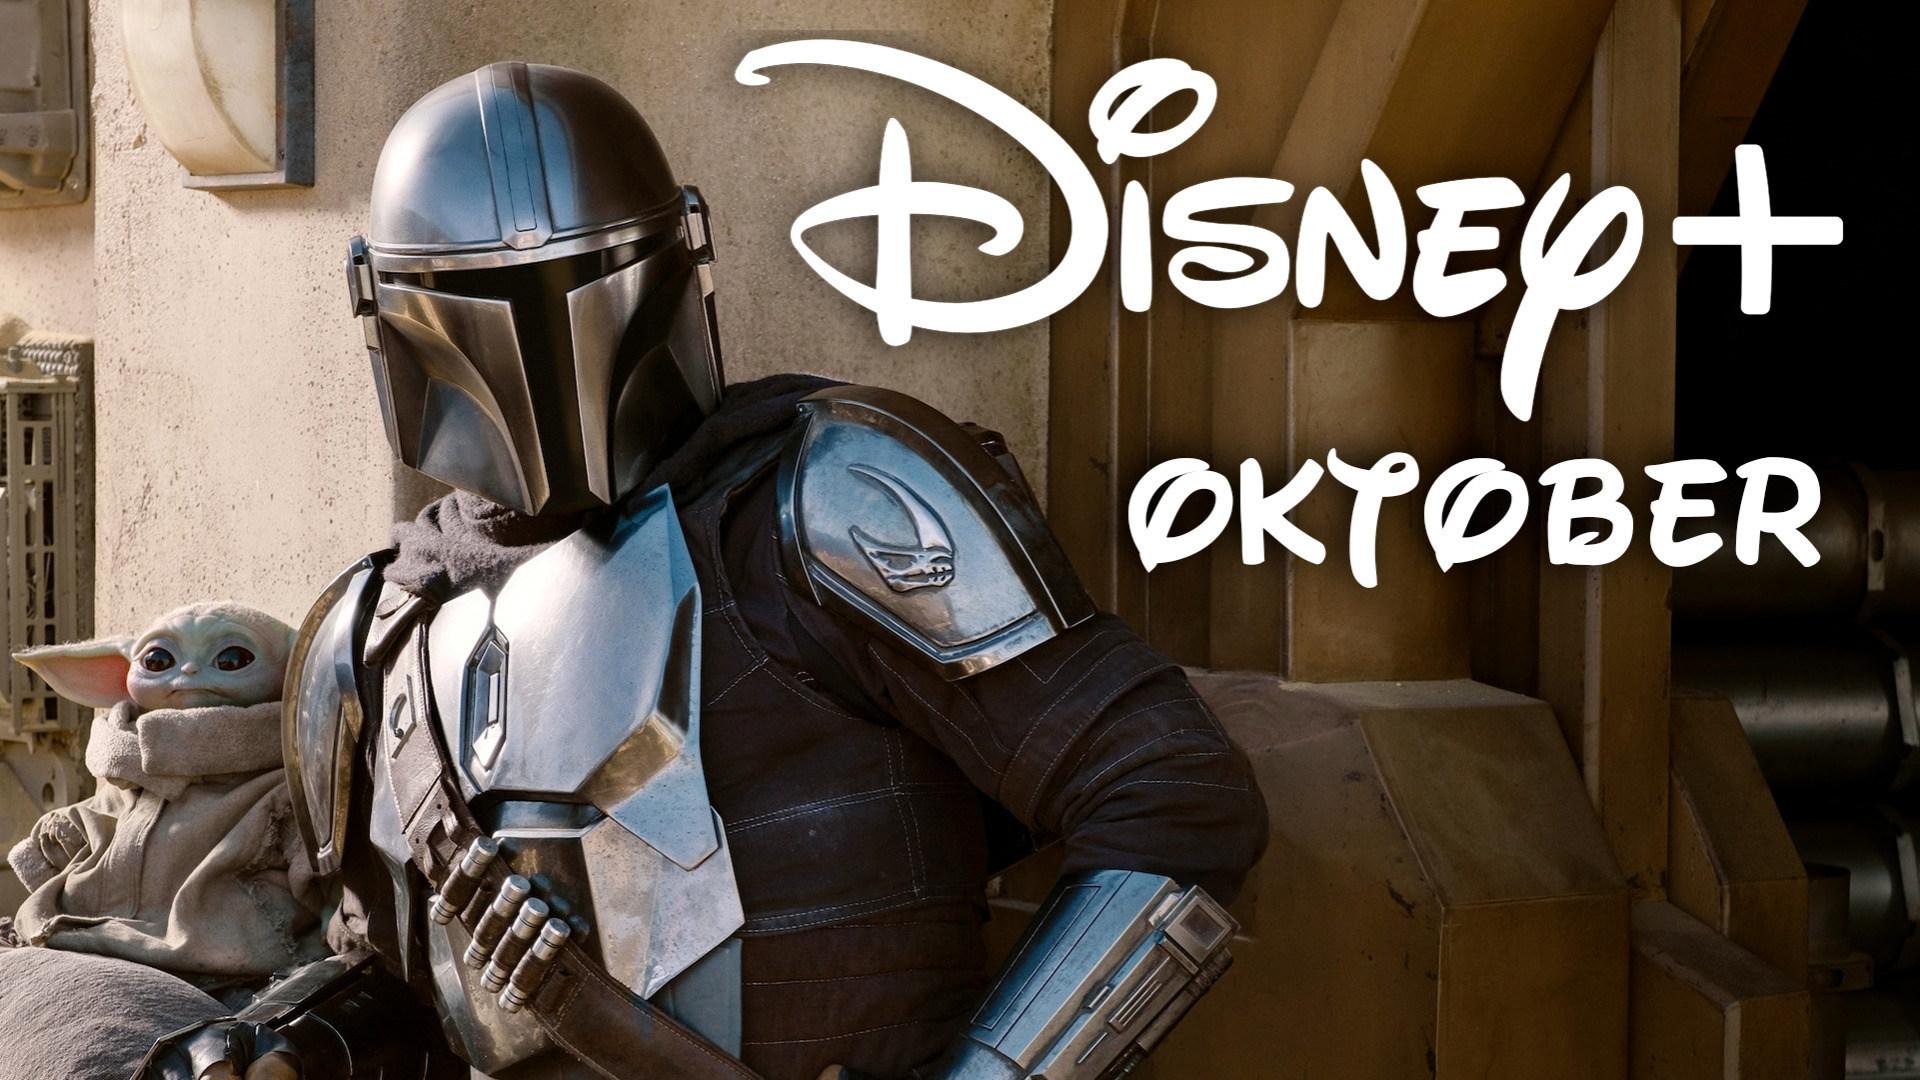 Streaming, Tv, Fernsehen, Filme, Streamingportal, Serien, Disney, Videostreaming, Disney+, The Mandalorian